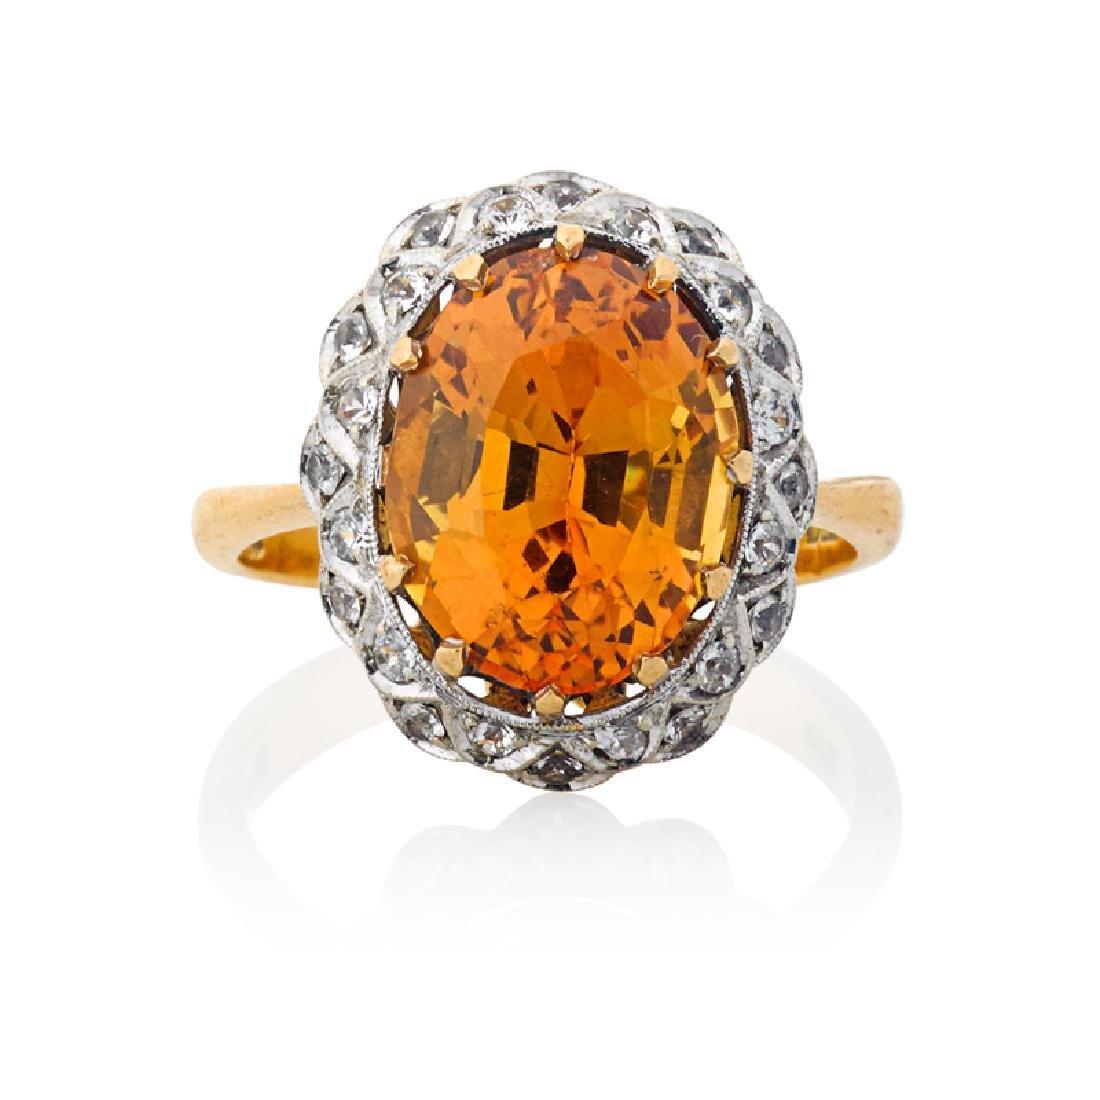 TOPAZ, DIAMOND & YELLOW GOLD RING